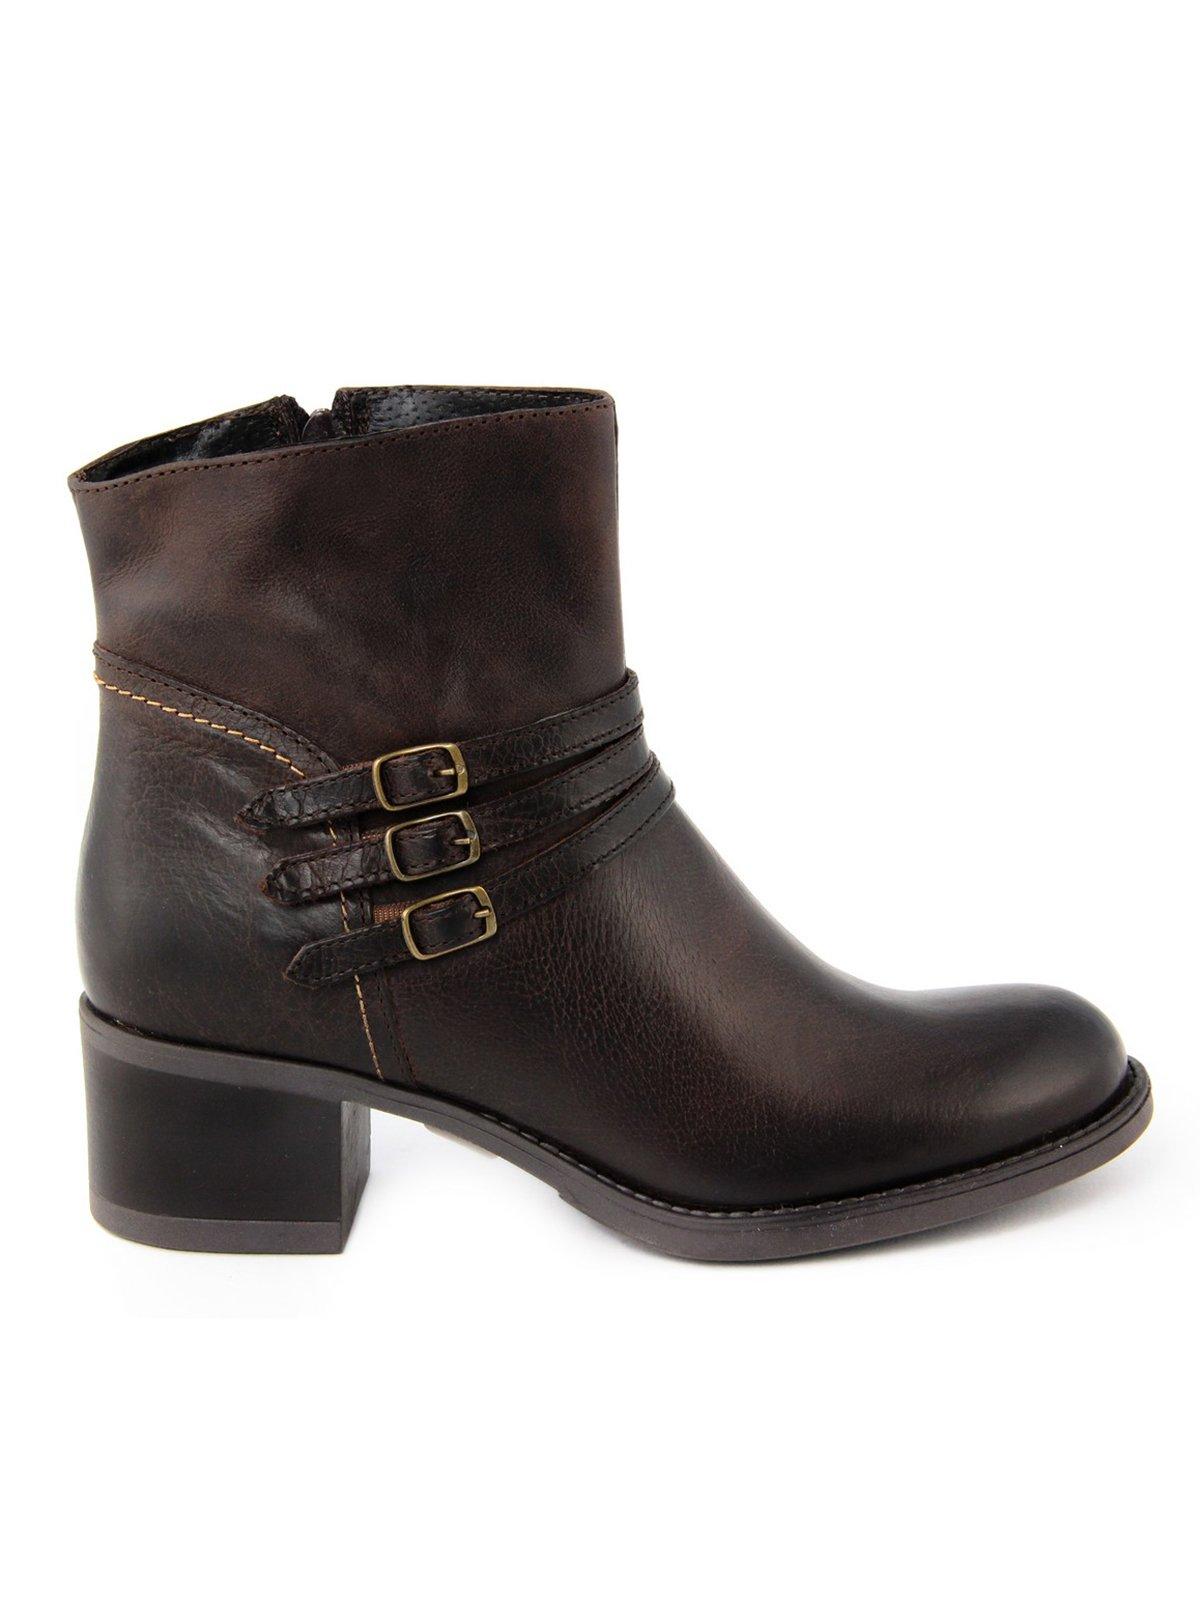 Ботинки коричневые   1998842